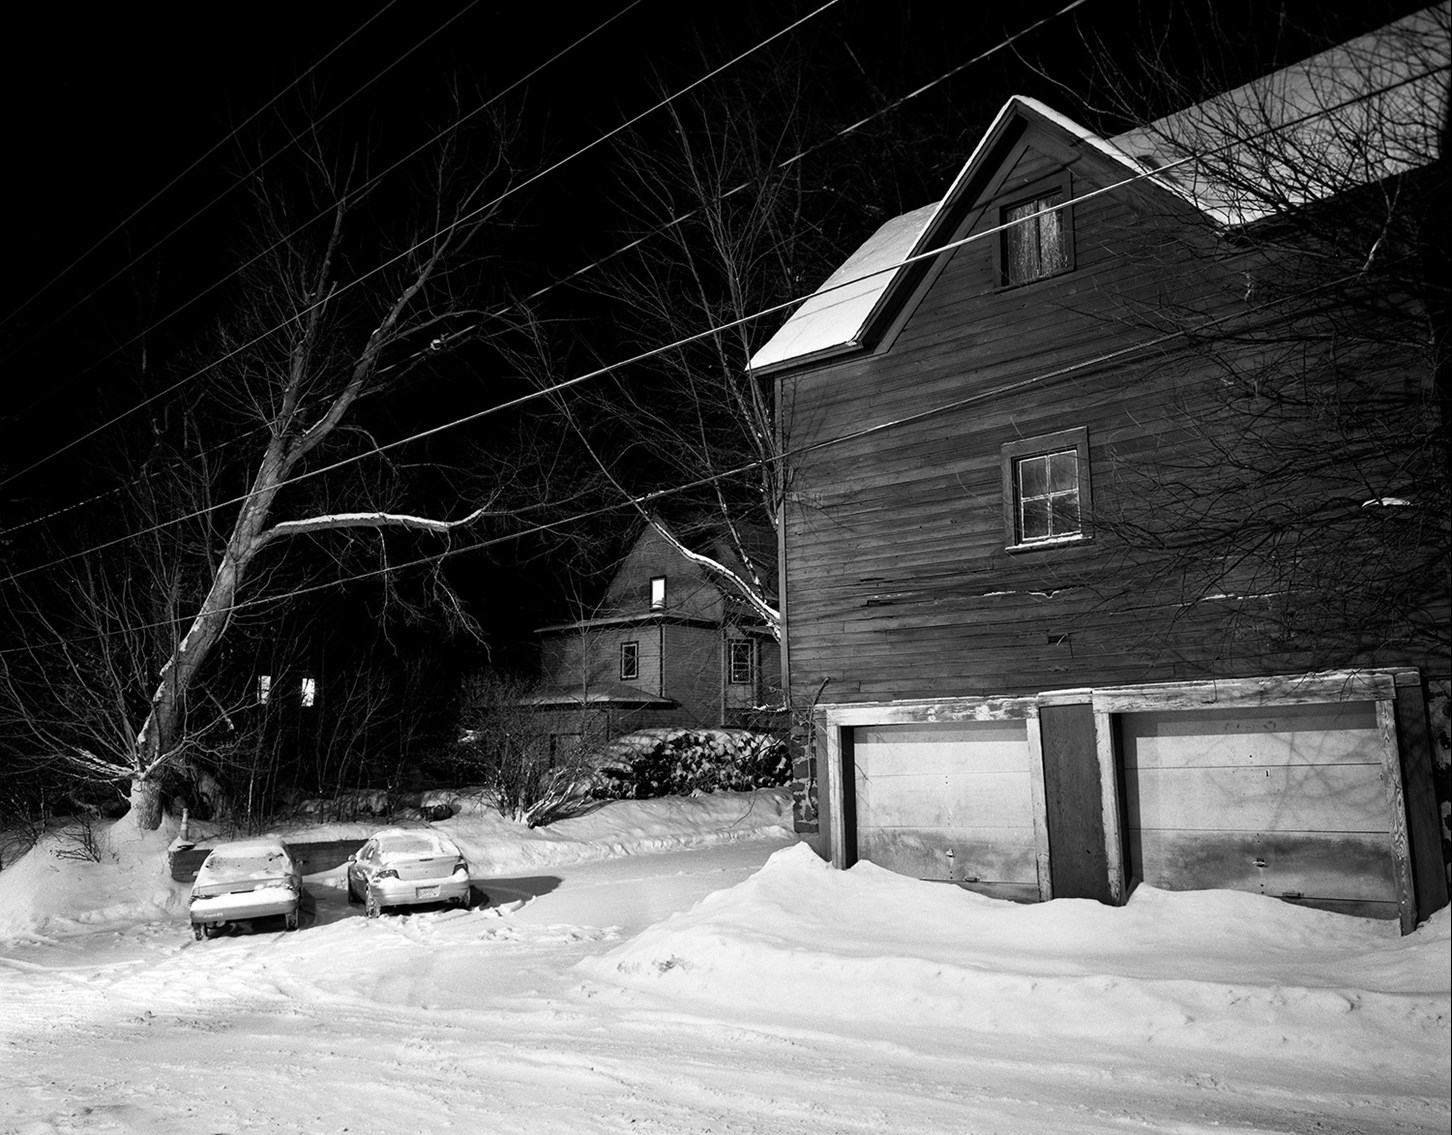 Alleyway Behind East 1st Street, Duluth, Minnesota, January 2011